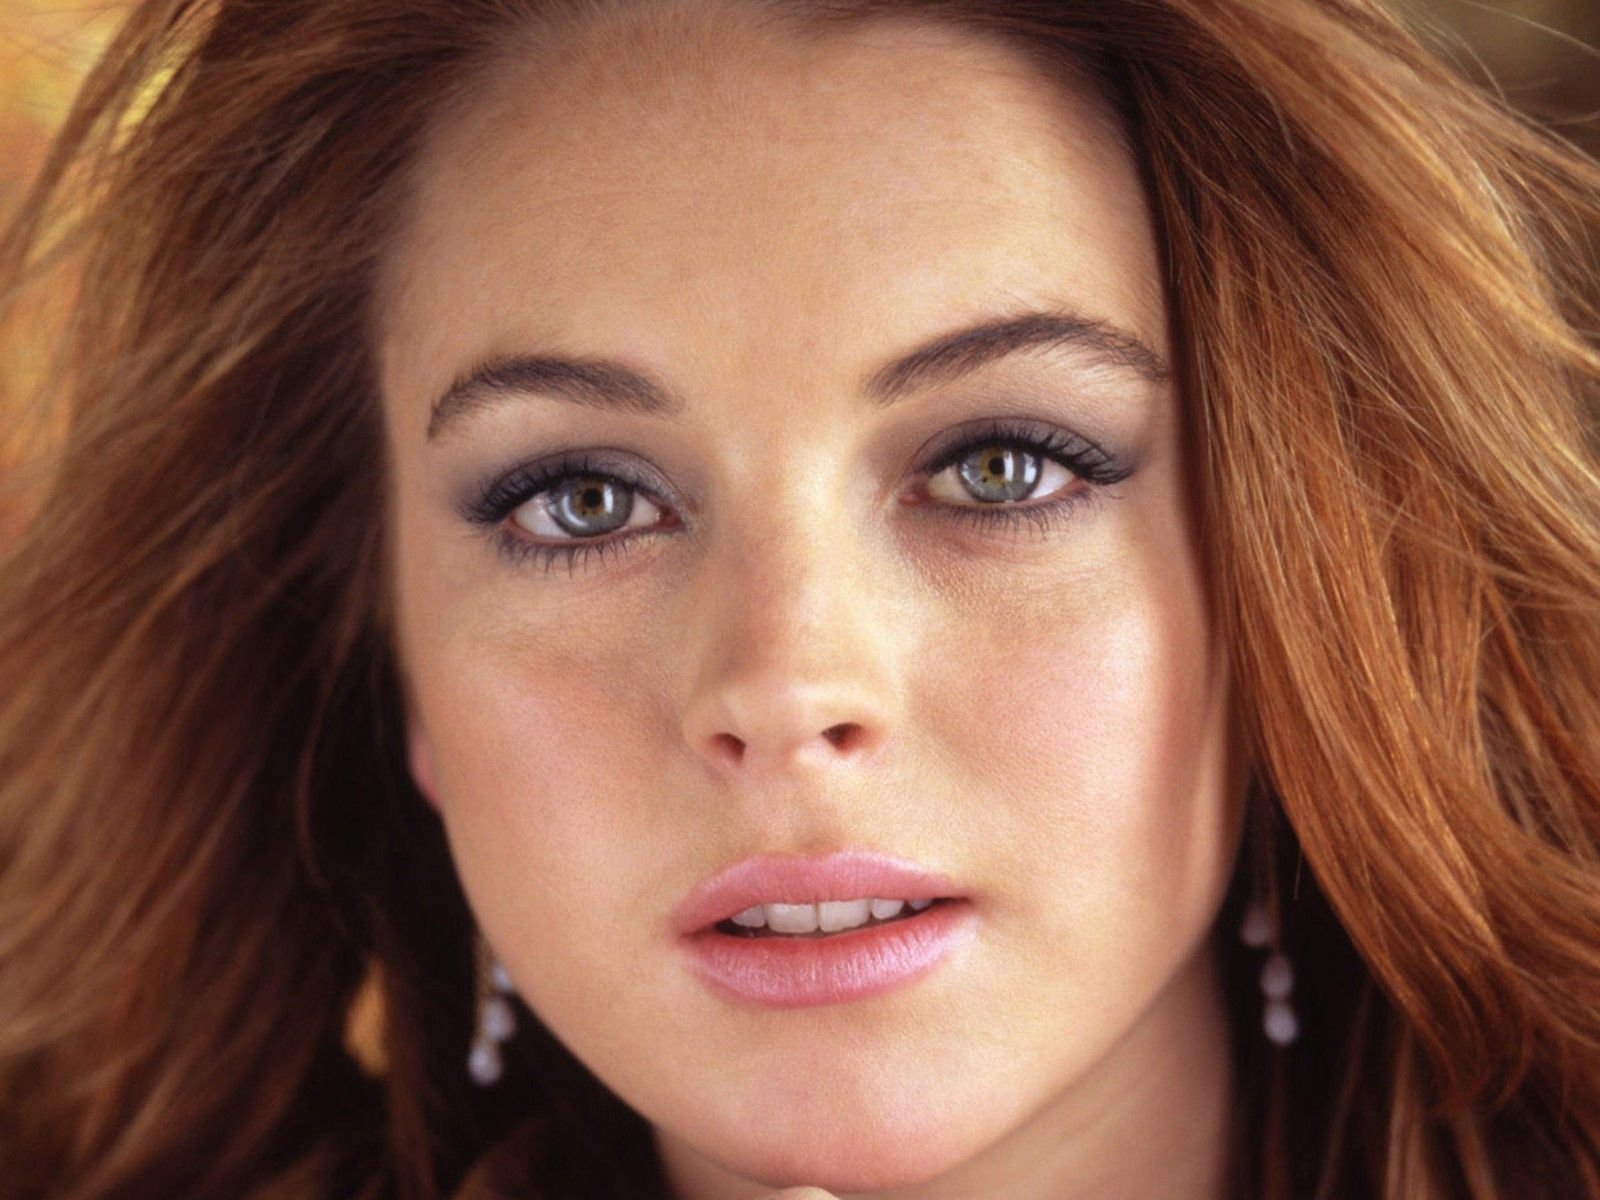 Fullwalls.blogspot.com Lindsay Lohan15 /free site lindsay lohan nude/